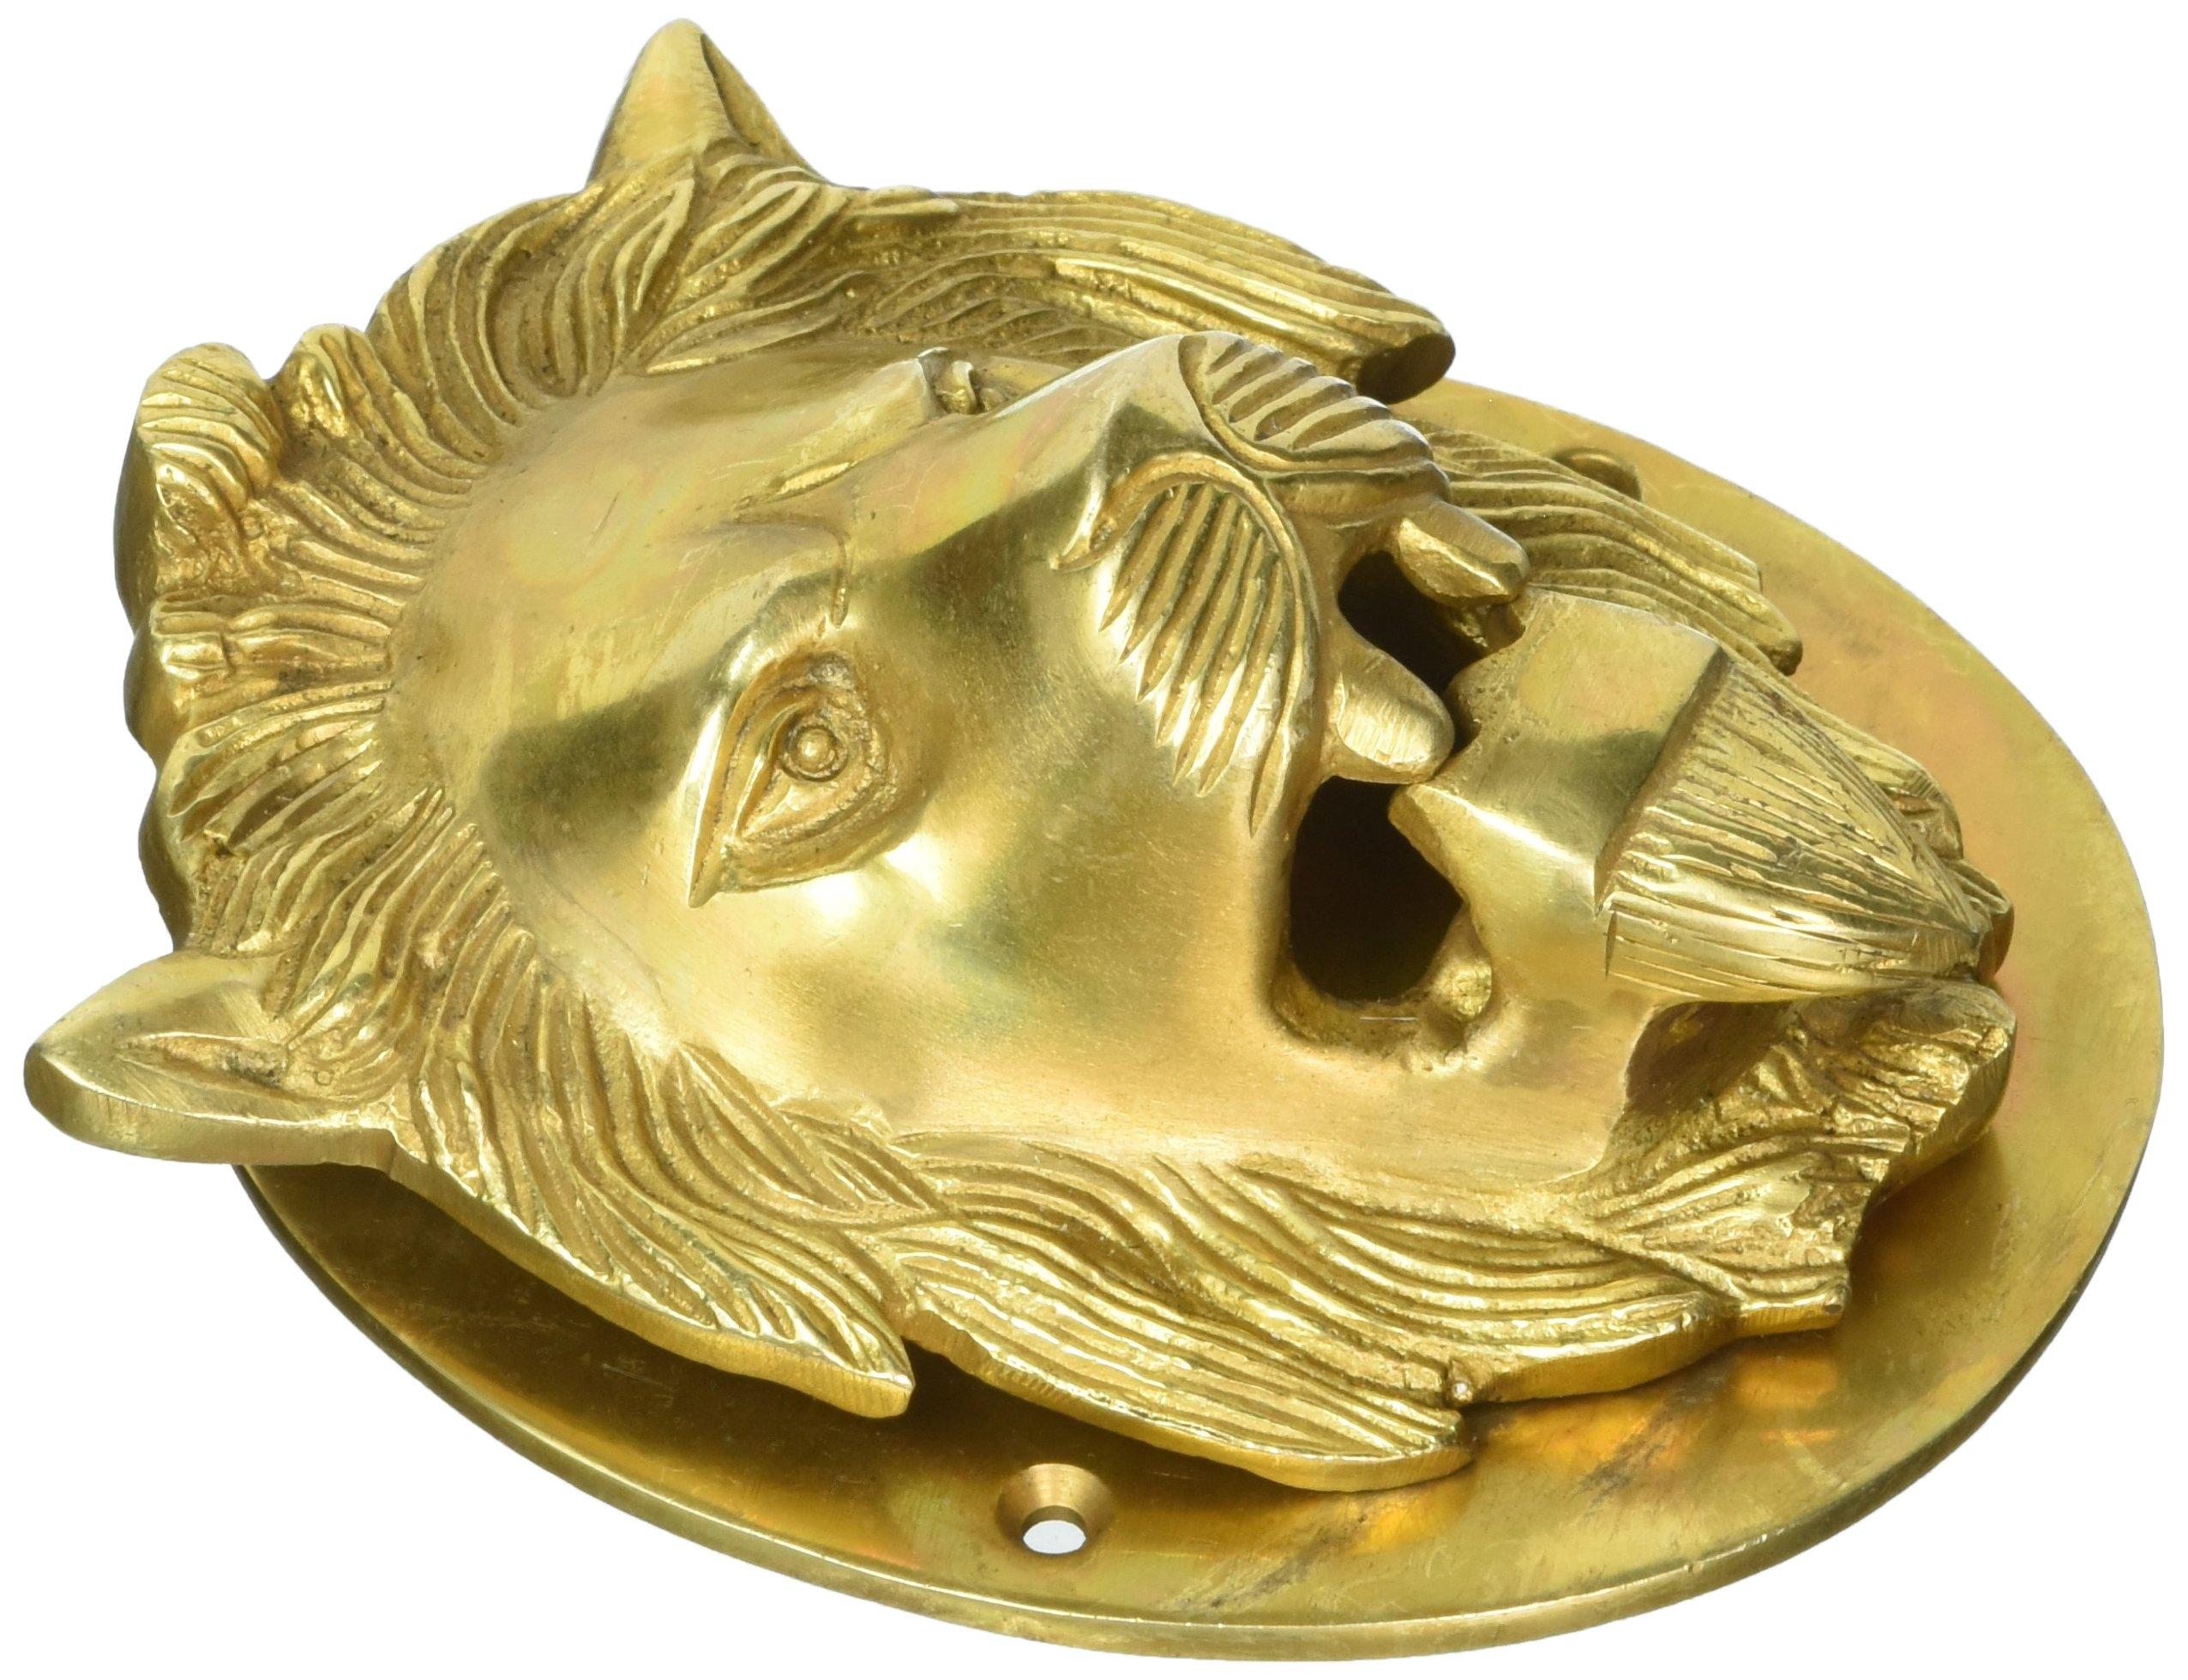 Aakrati VZH366 Lion Door Knocker, Brass Yellow